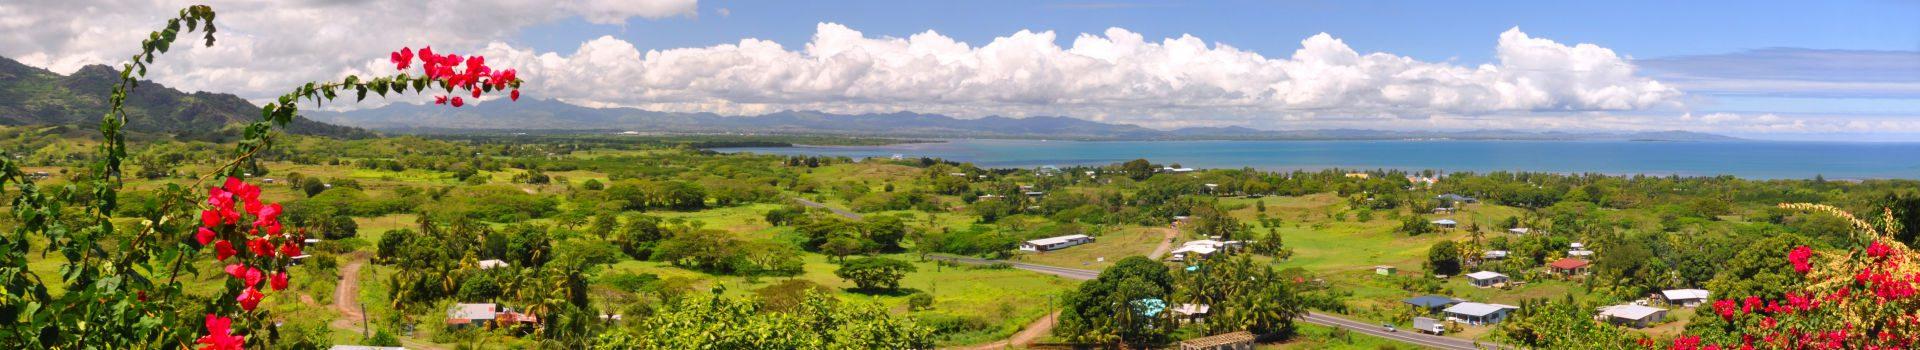 Redseason - Holidays - Panorama Of The Fijian West Coast